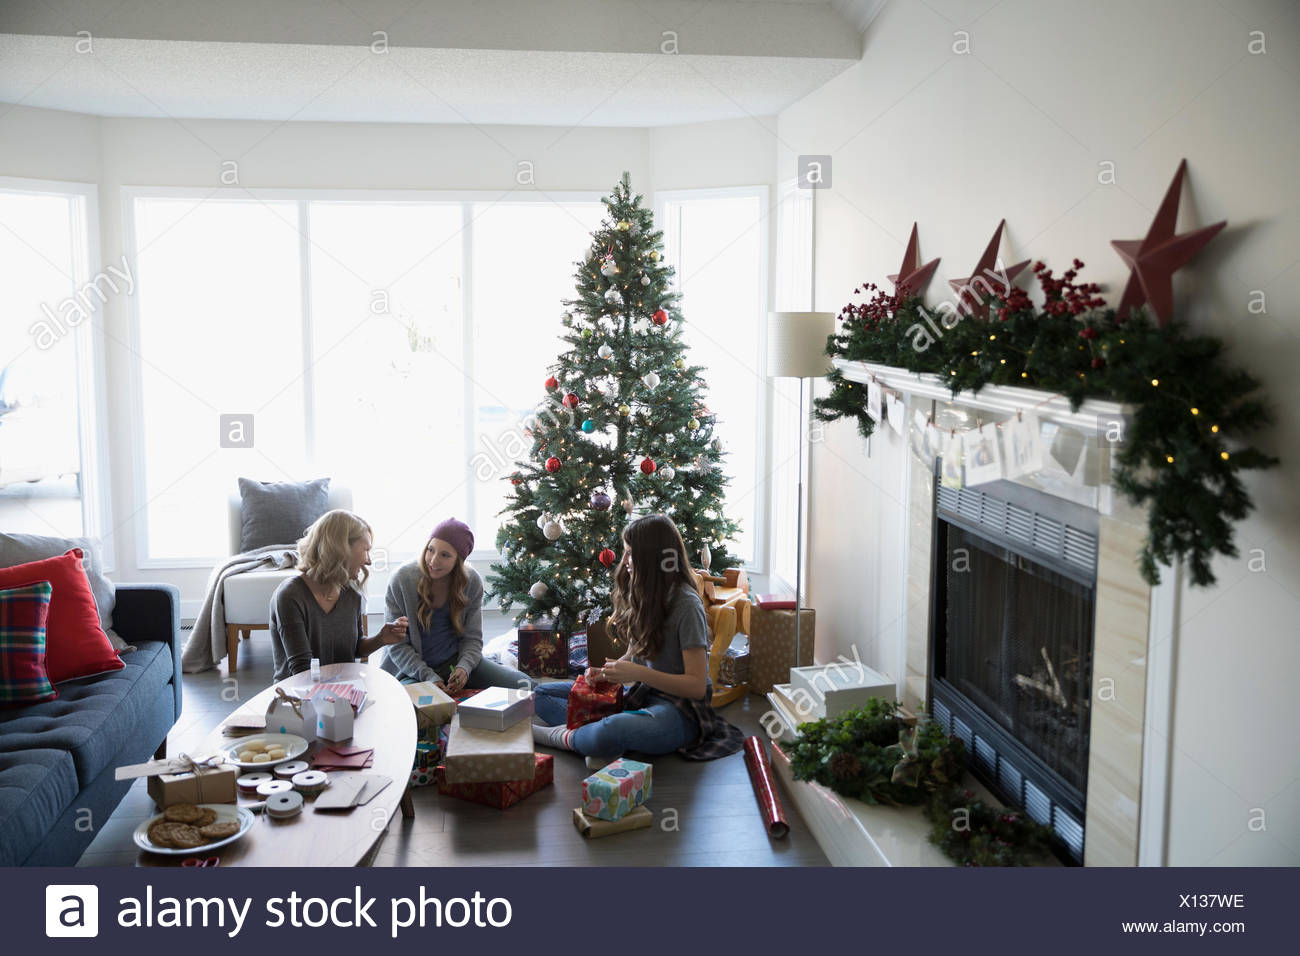 Simple Paper Christmas Tree Stock Photos & Simple Paper Christmas ...